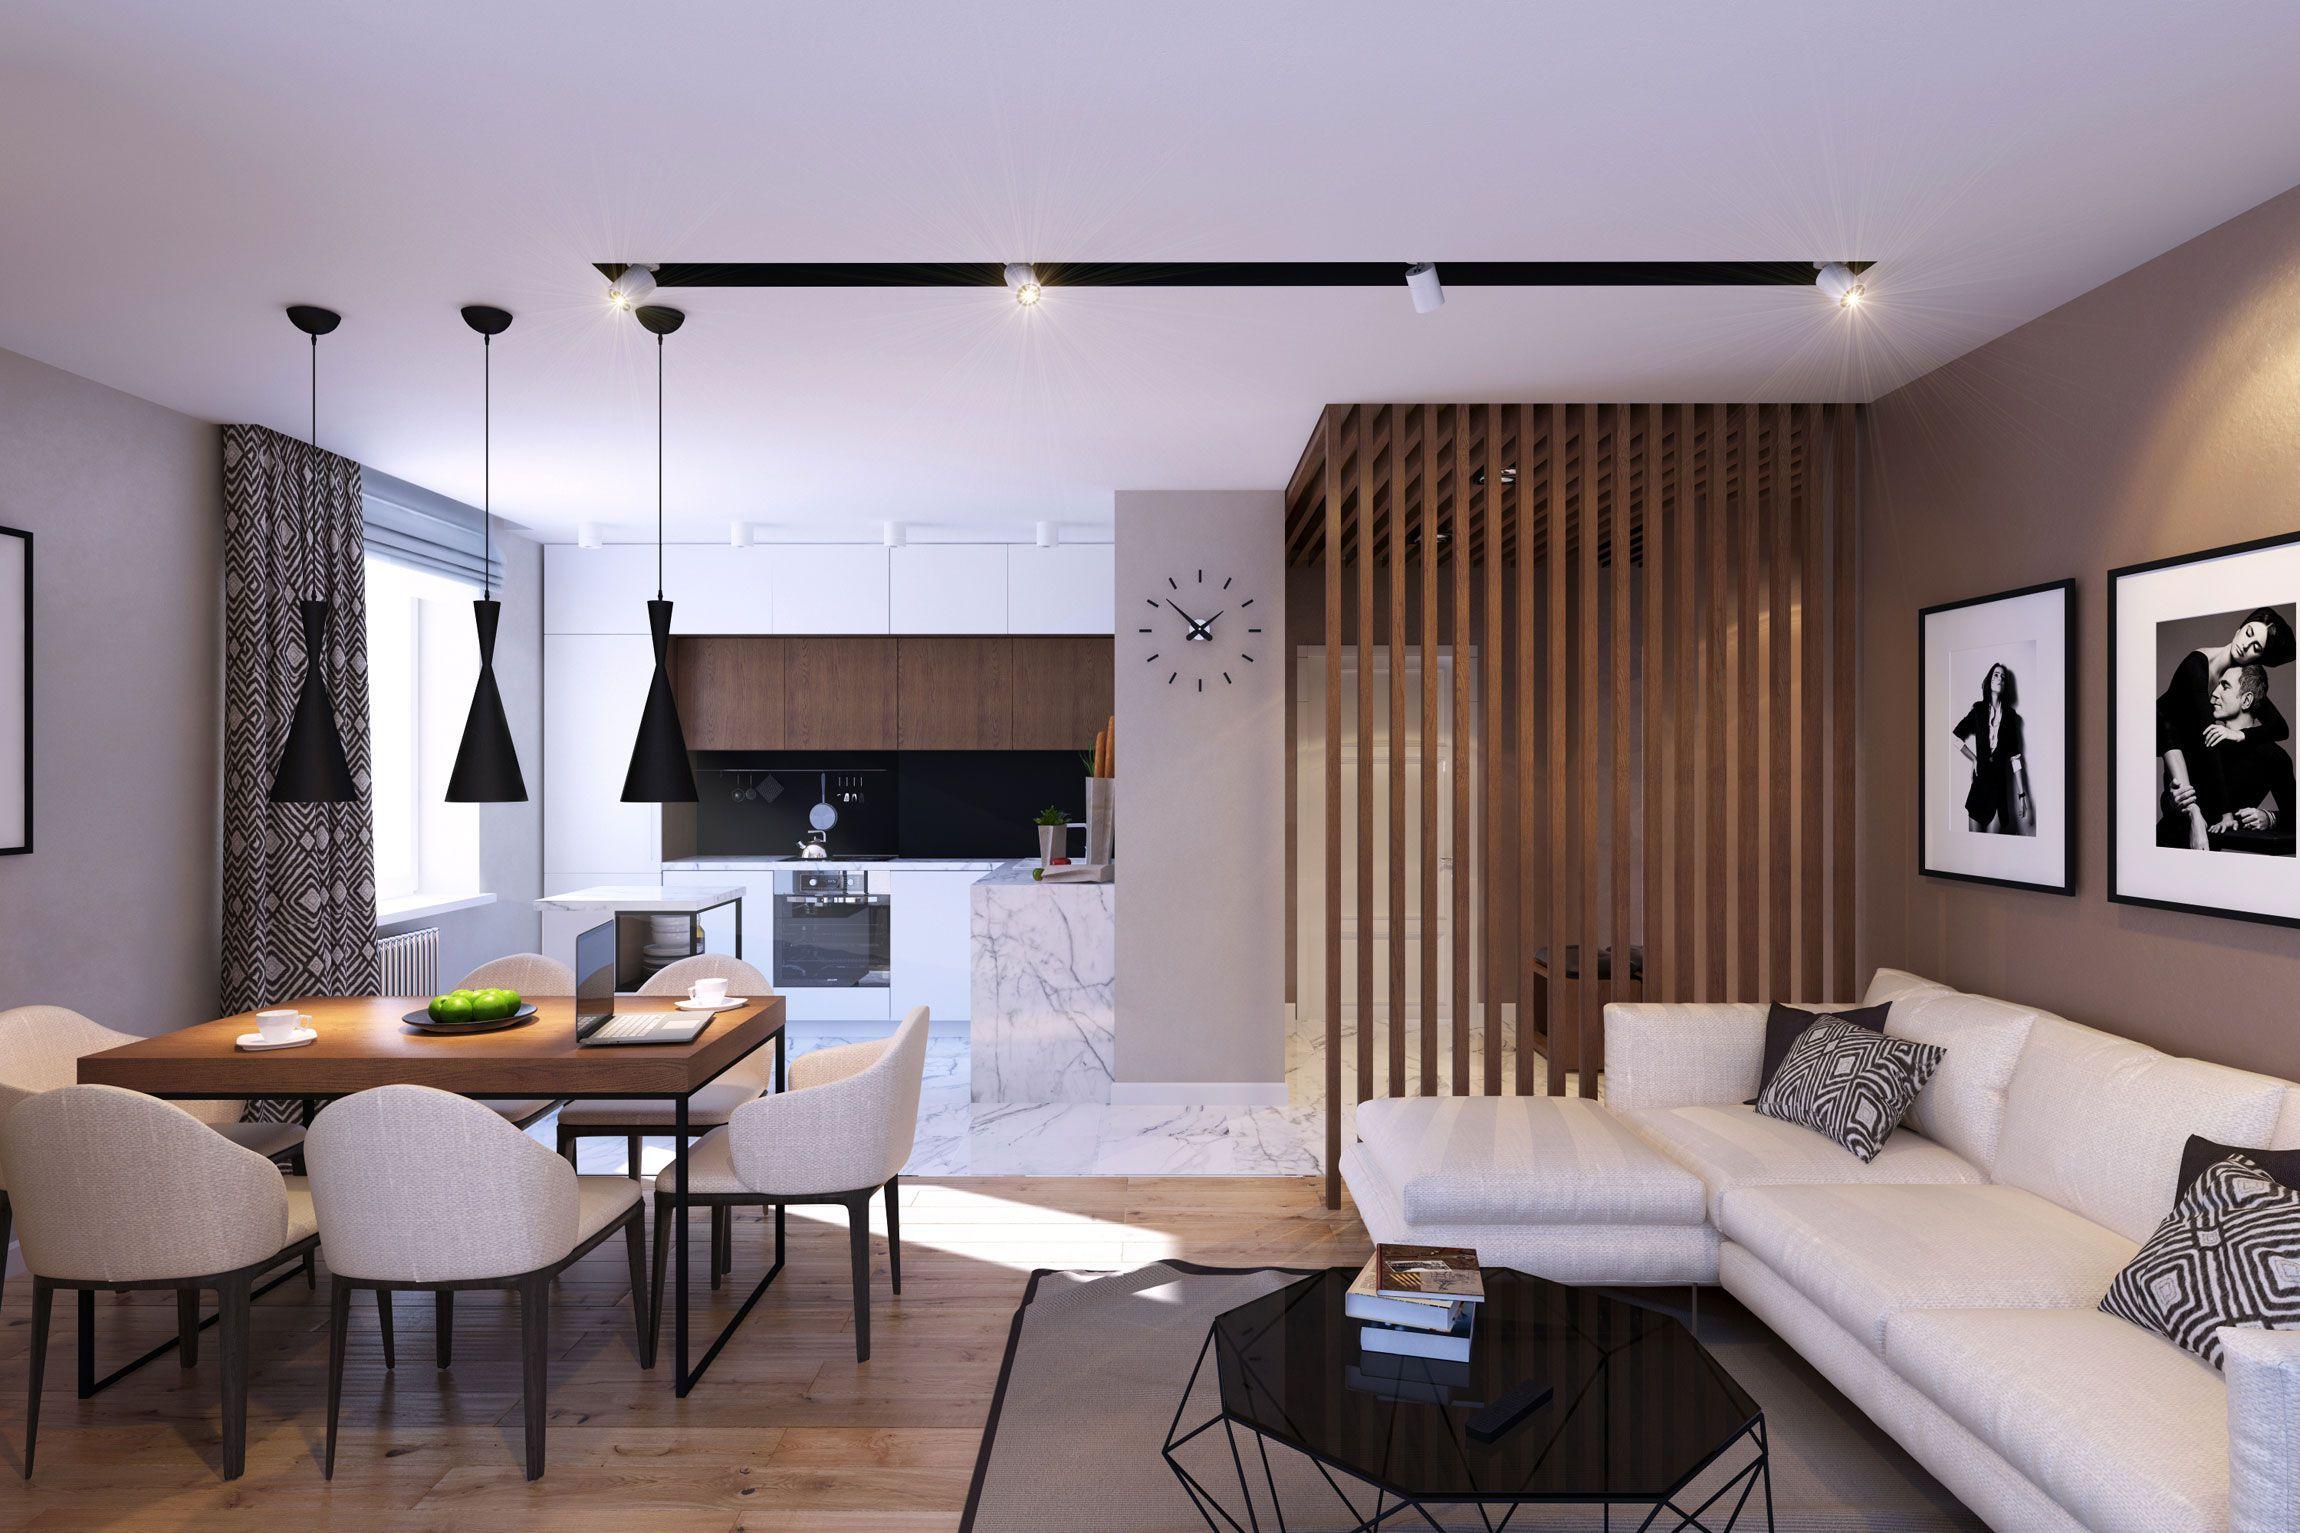 Bogatyrskiy modern apartment 03